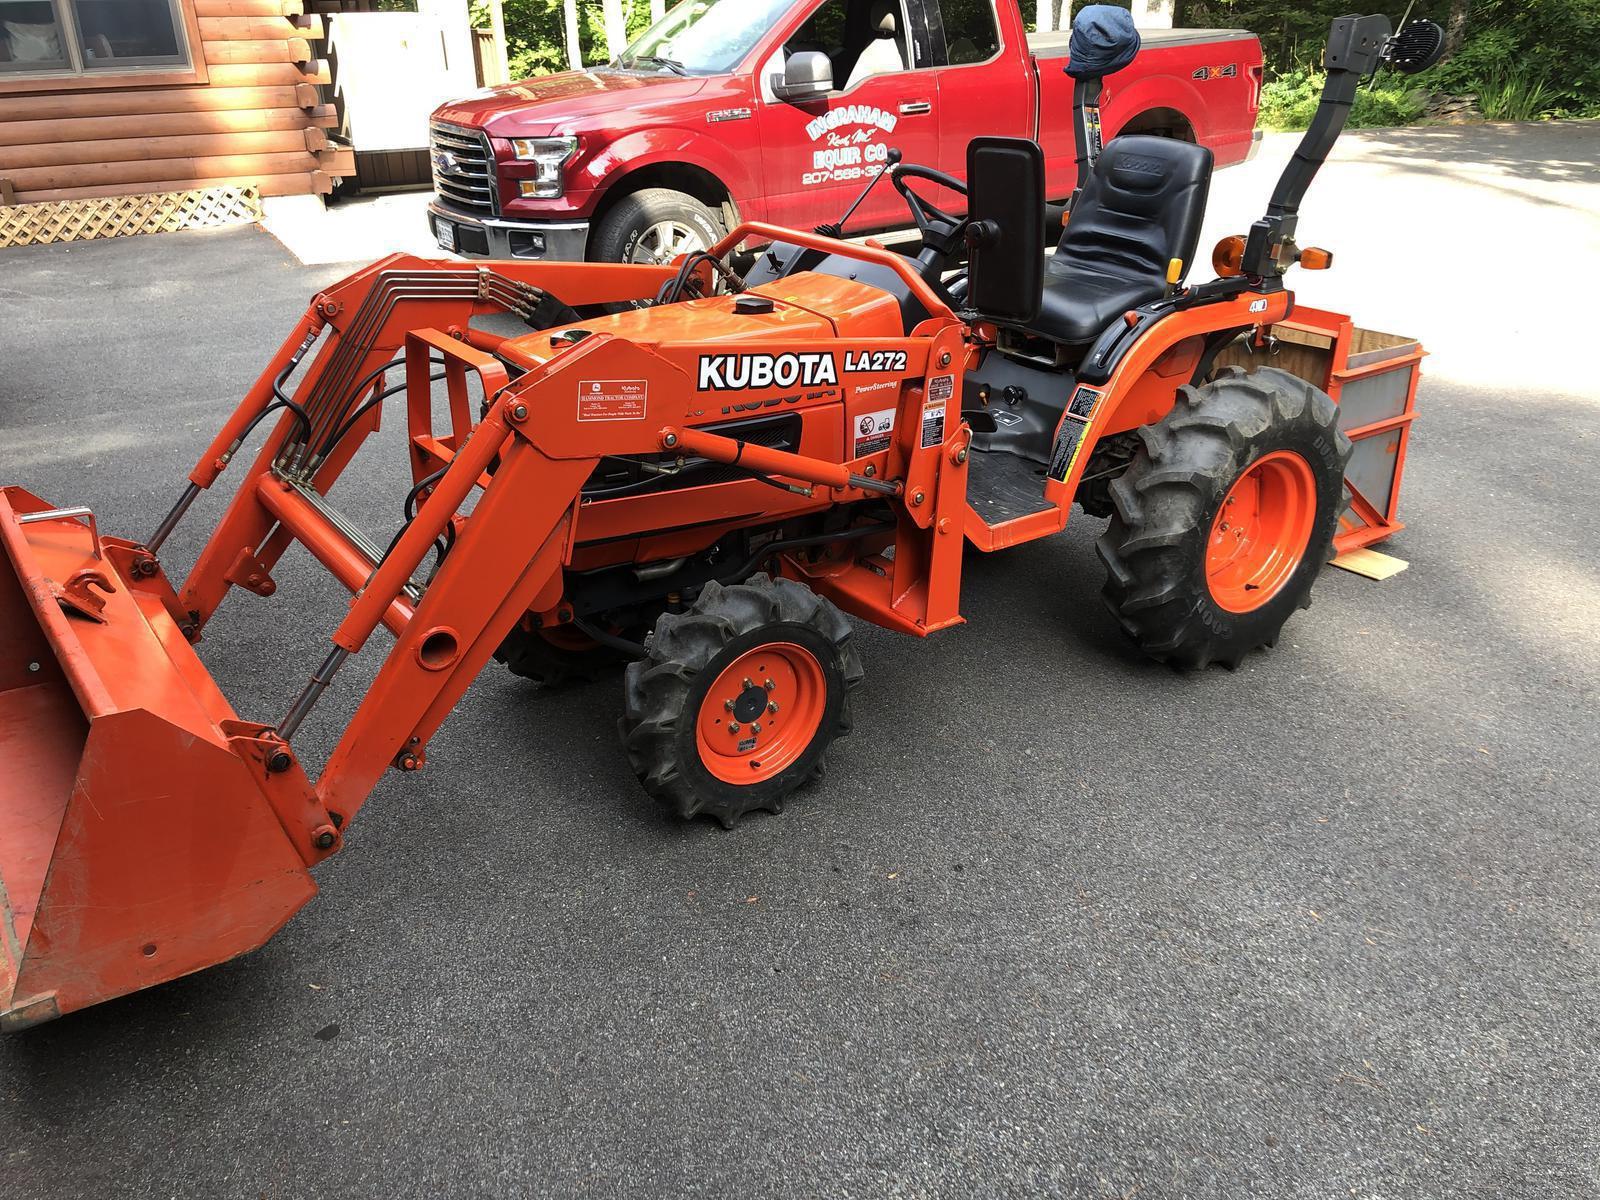 Inventory Ingraham Equipment Knox, ME (800) 236-4160